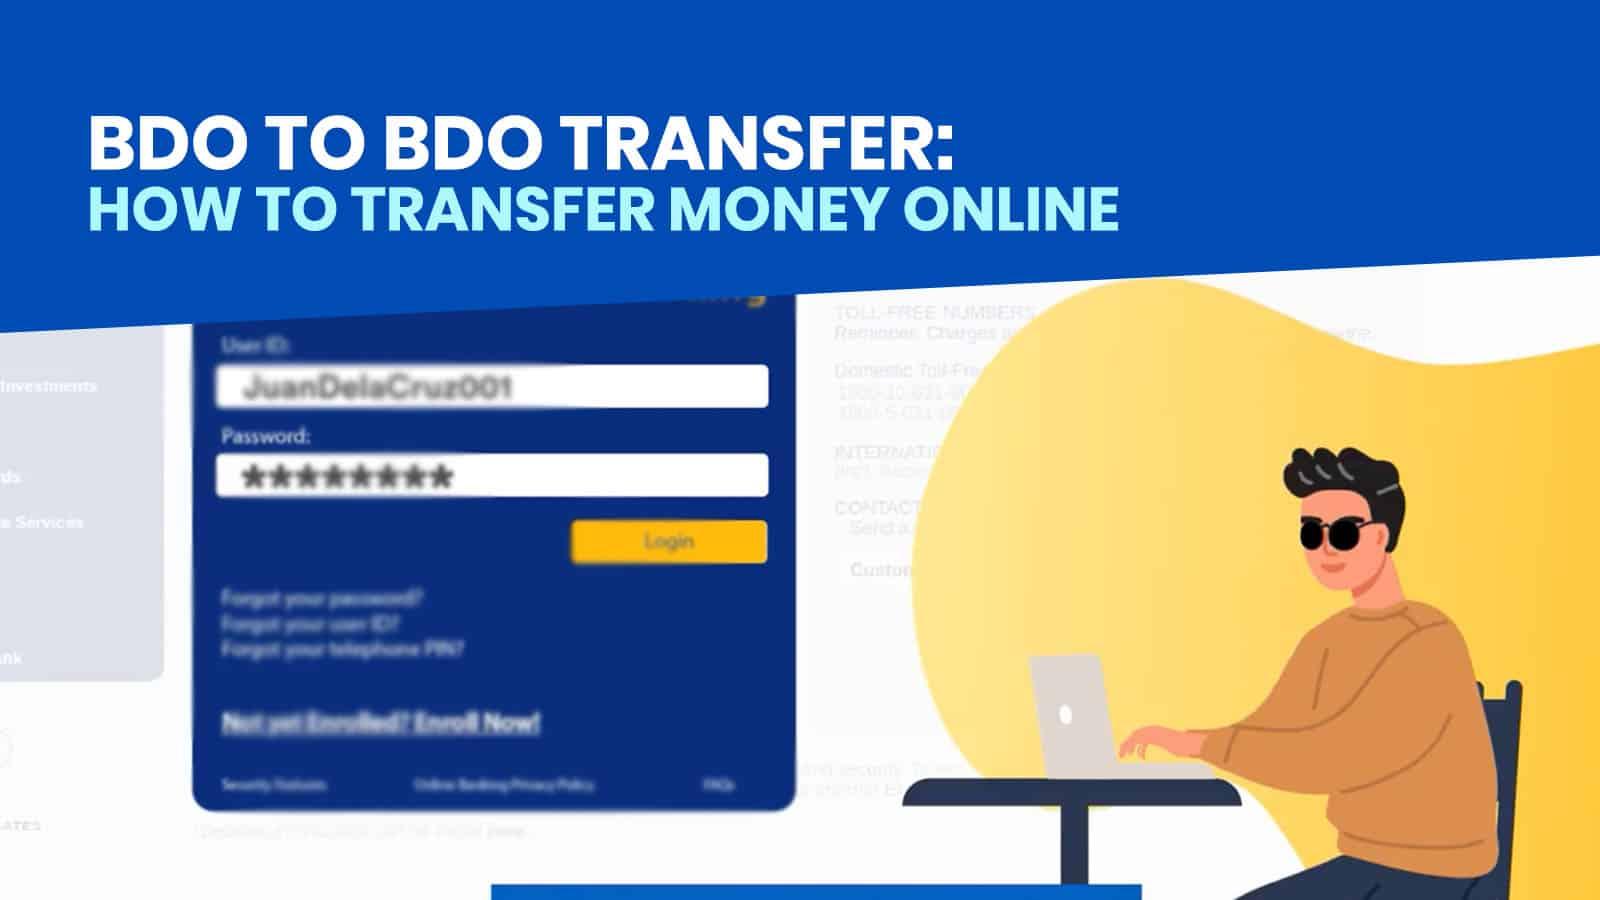 BDO to BDO: How to Transfer Money to Another BDO Account via Online Banking